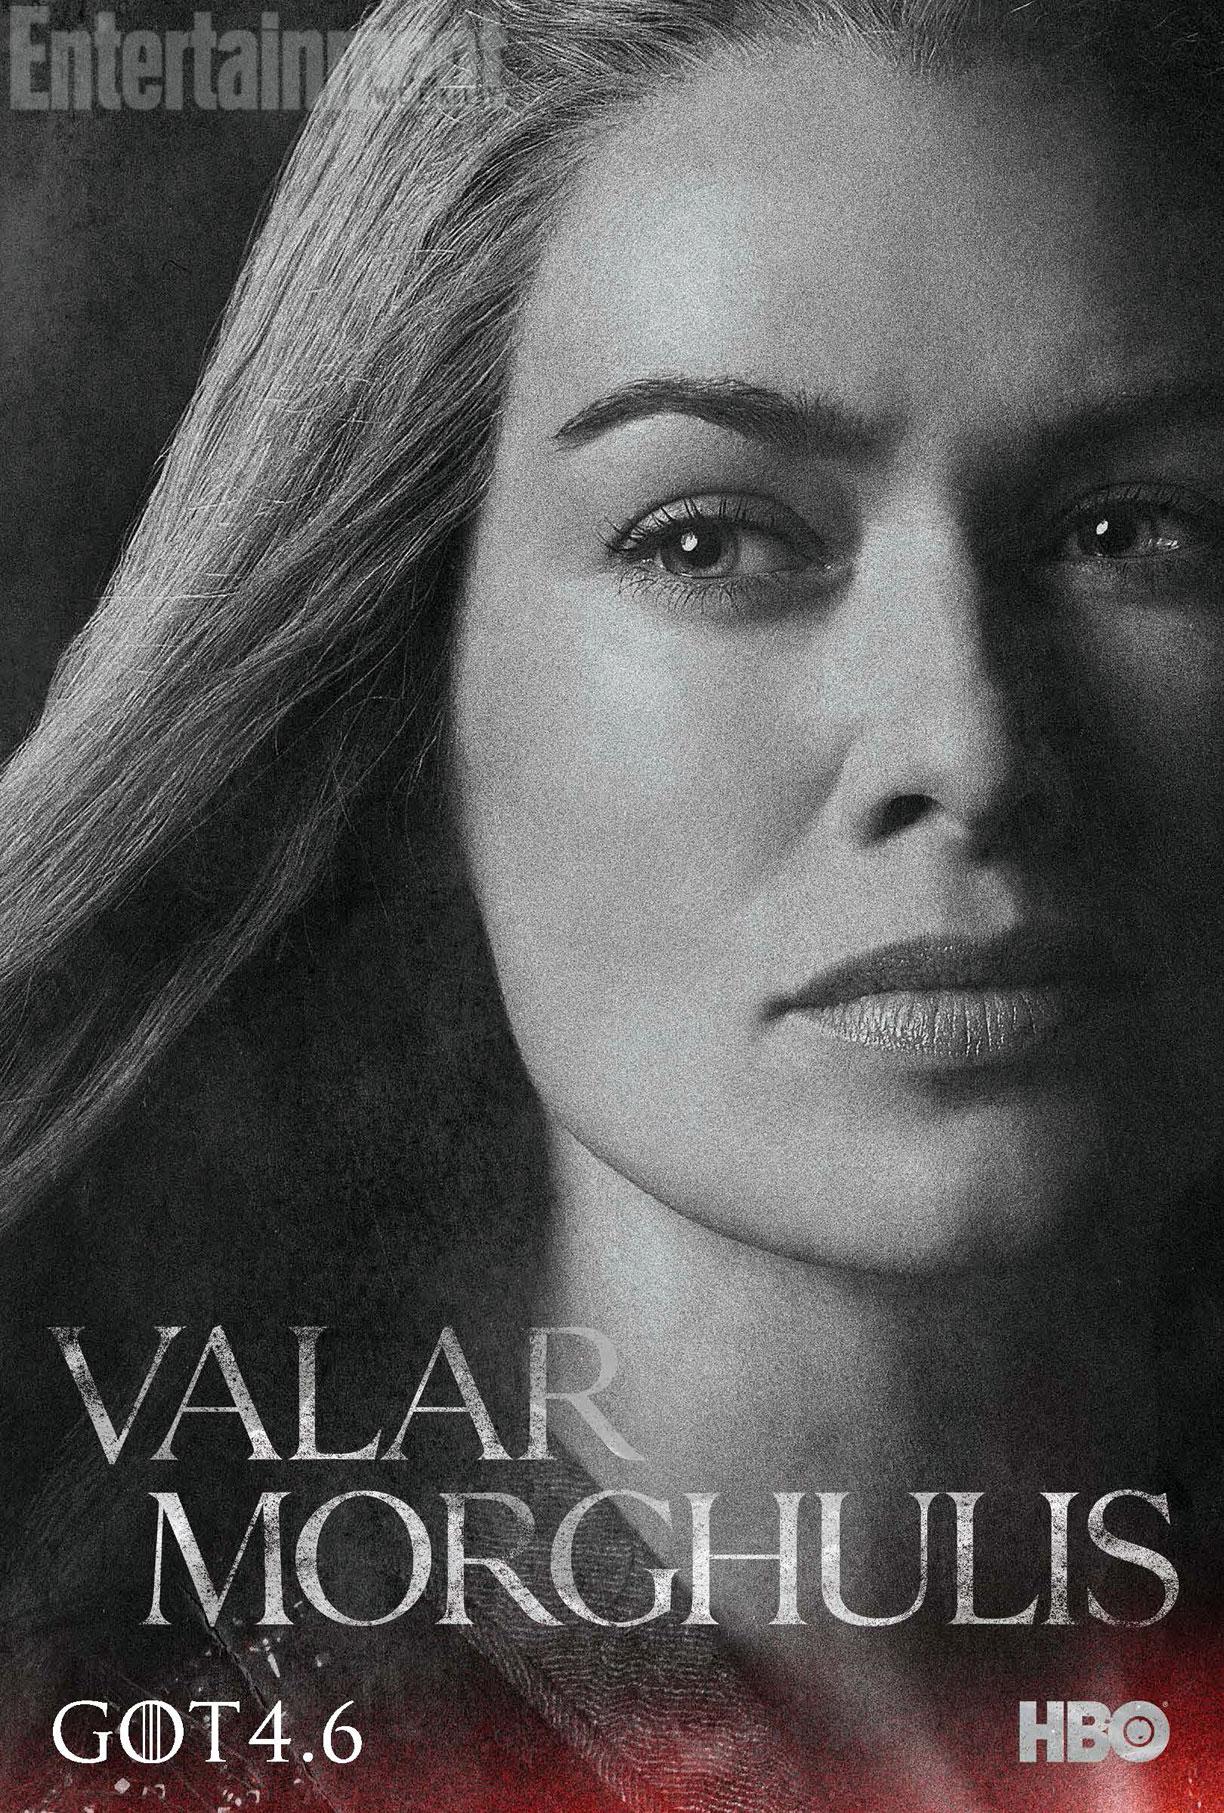 GOT-CERSEI- nouveau poster saison 4 valar morghulis brain damaged